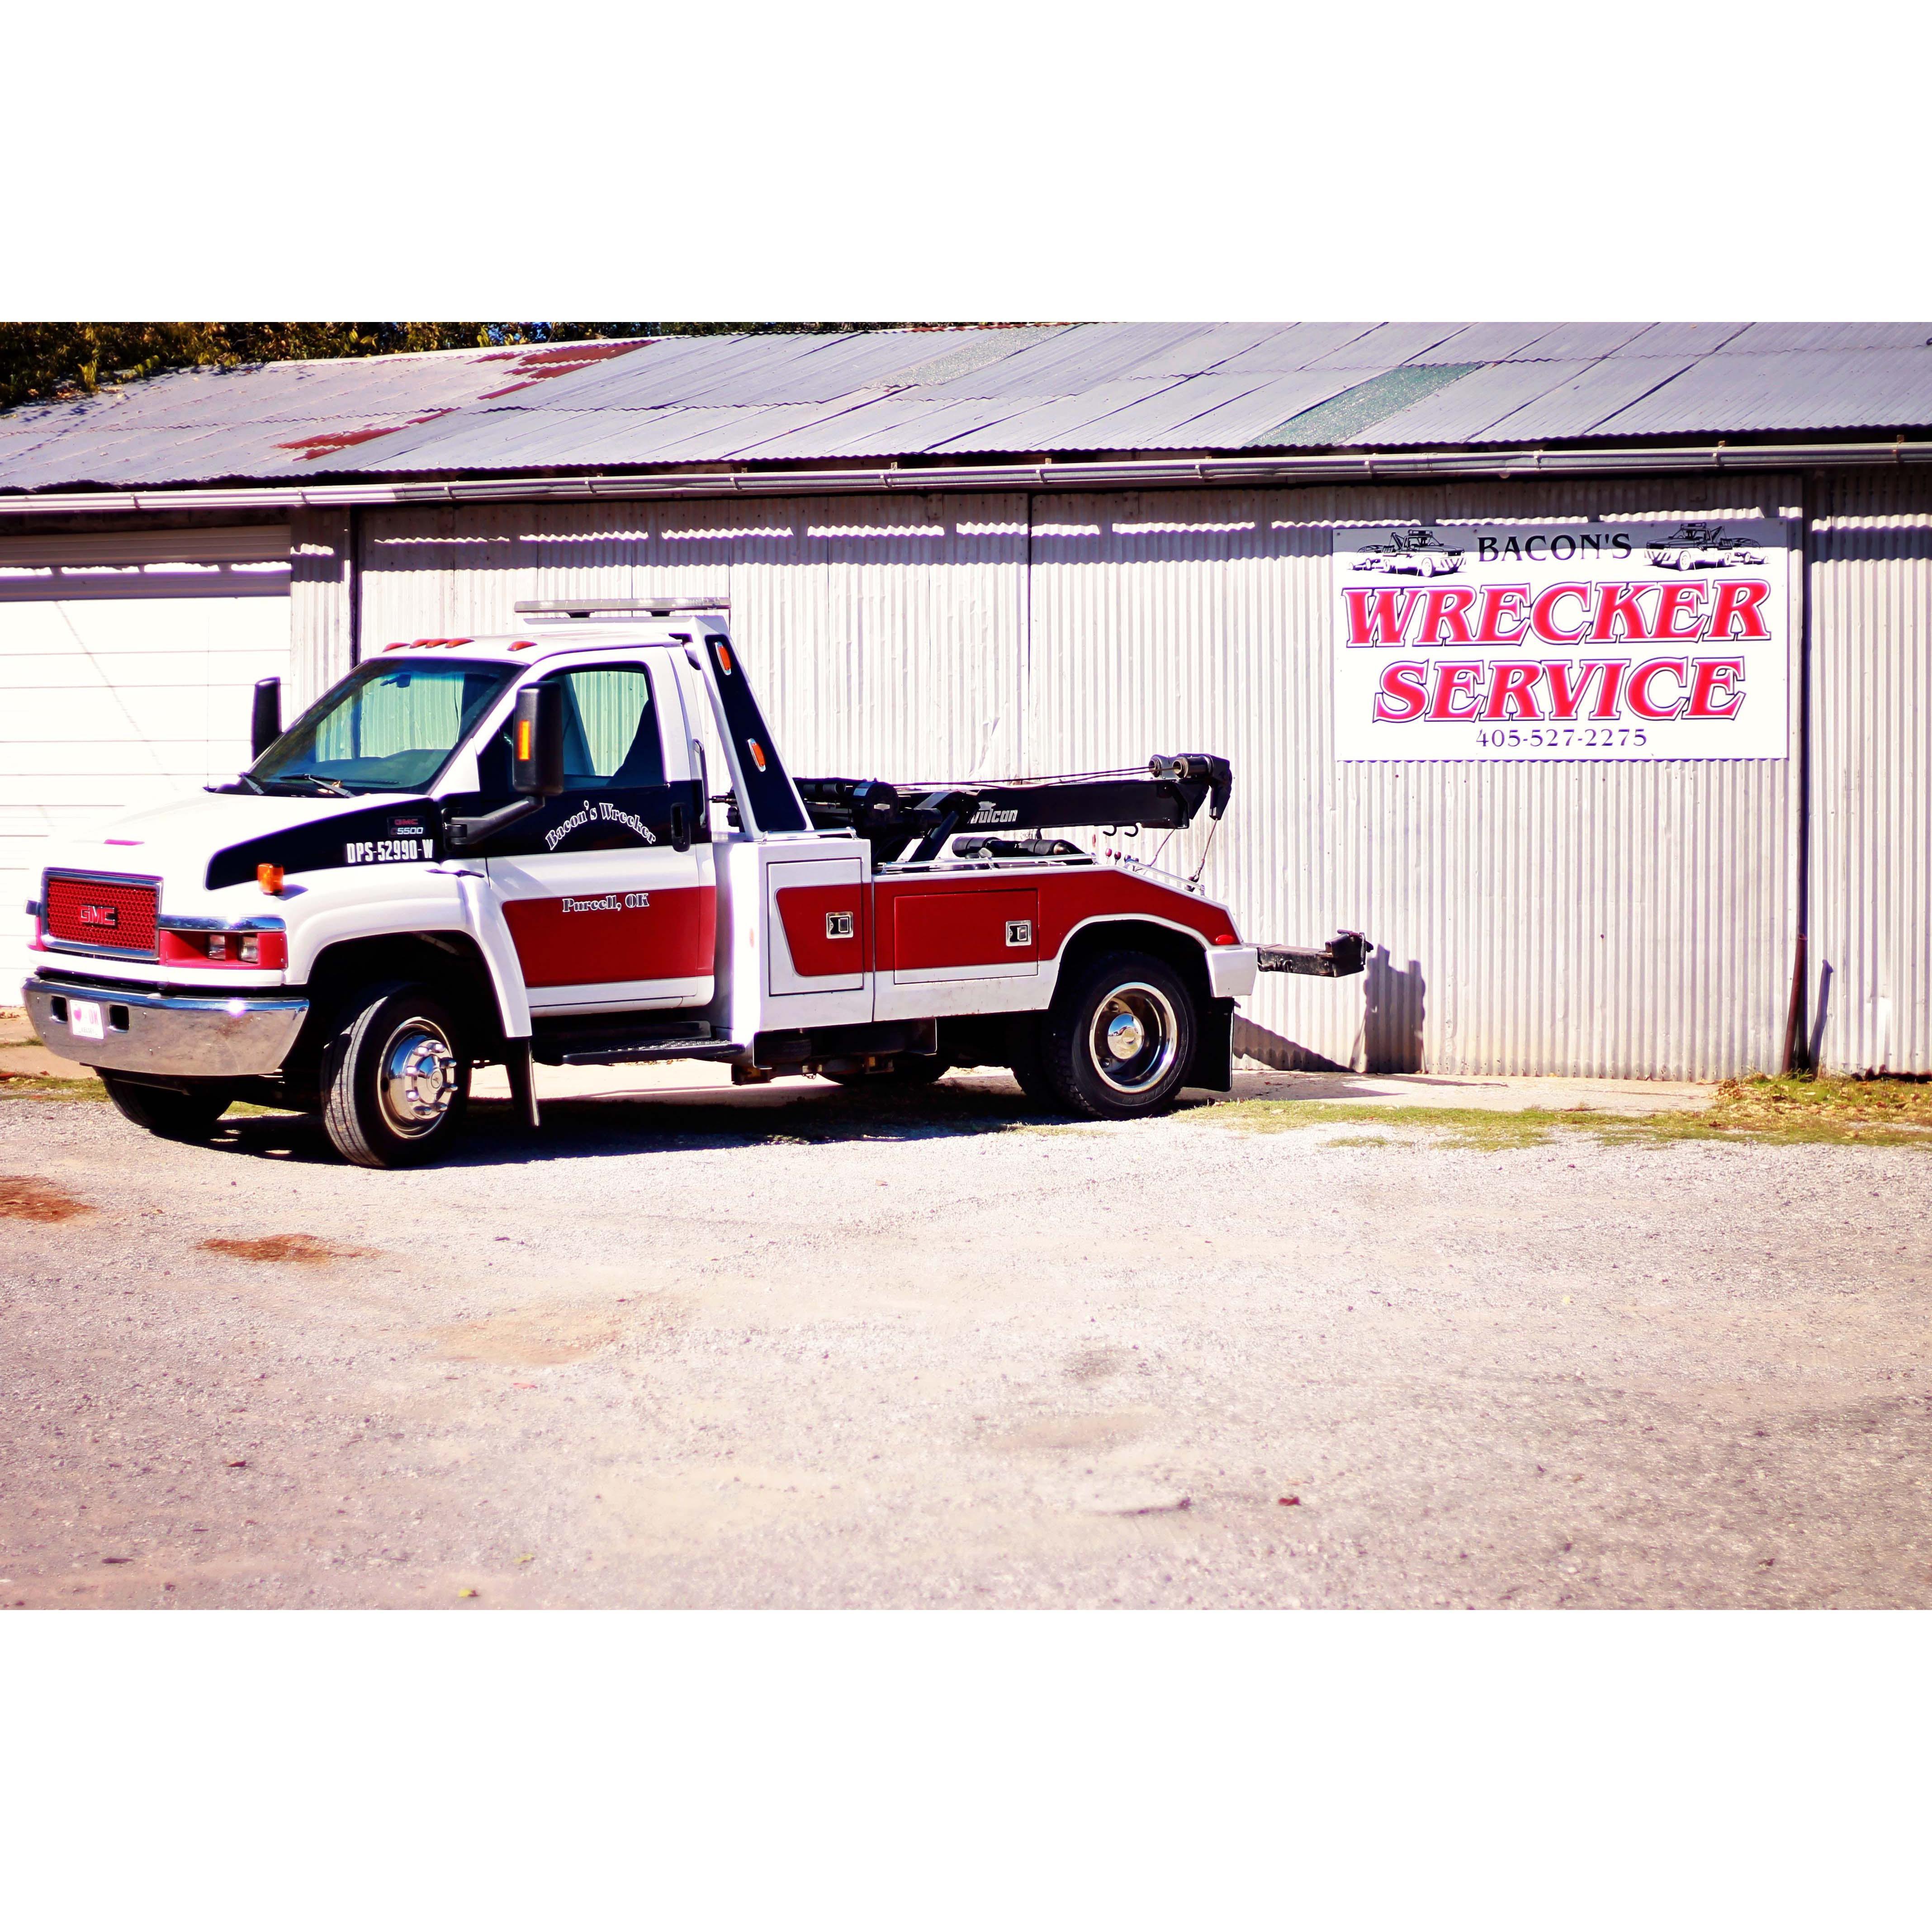 Bacon's Wrecker Service LLC